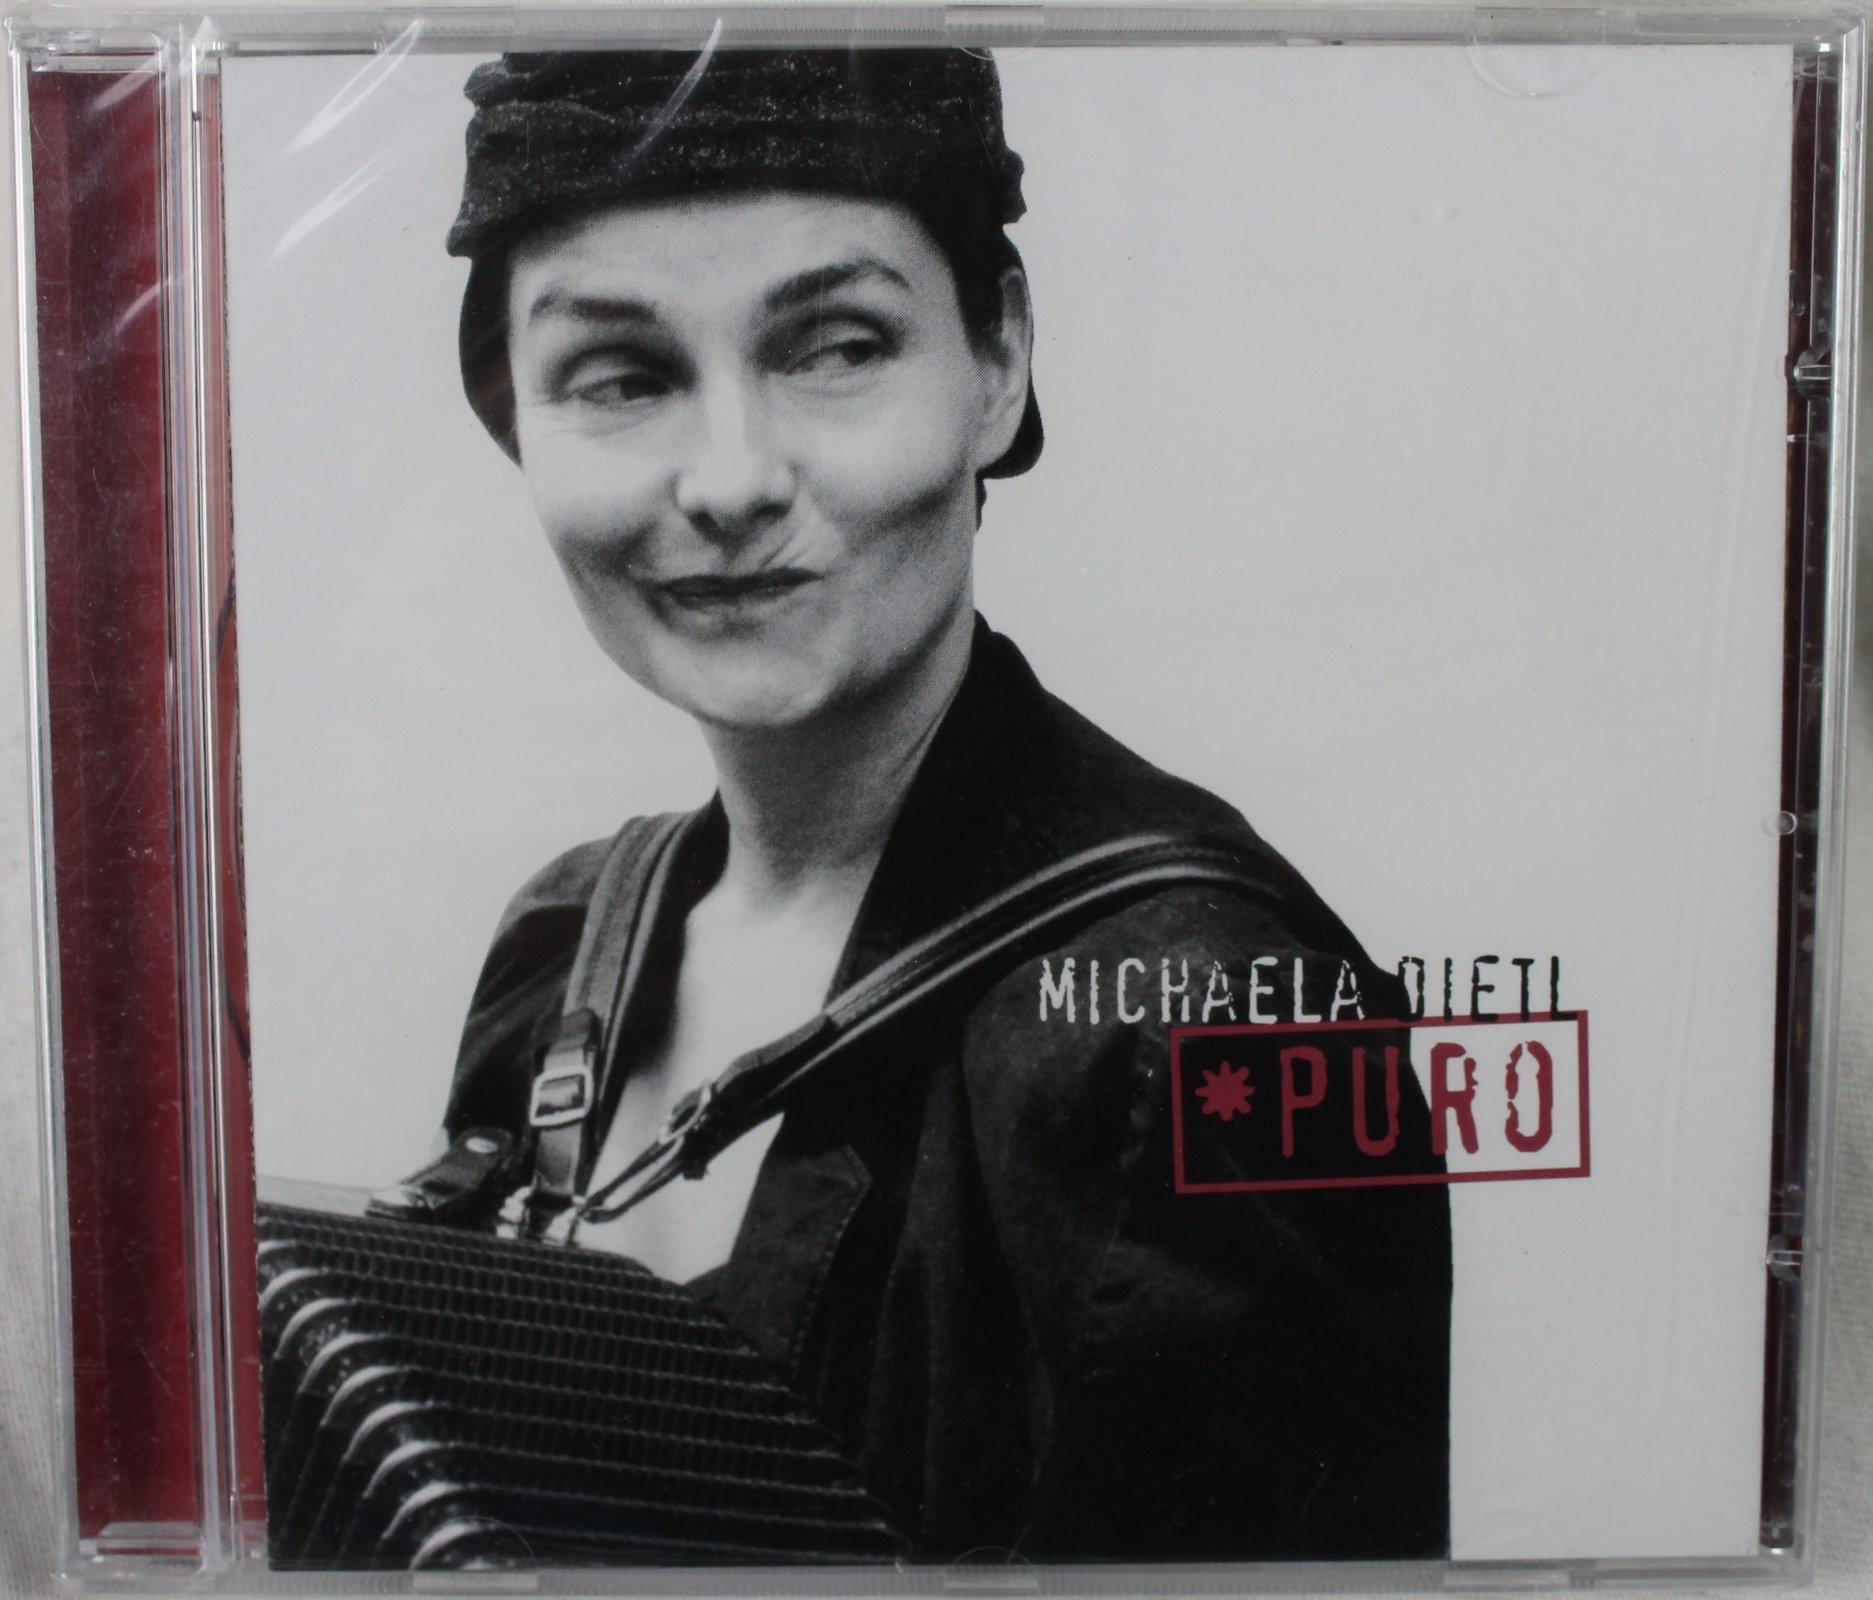 Puro by Michaela Dietl CD